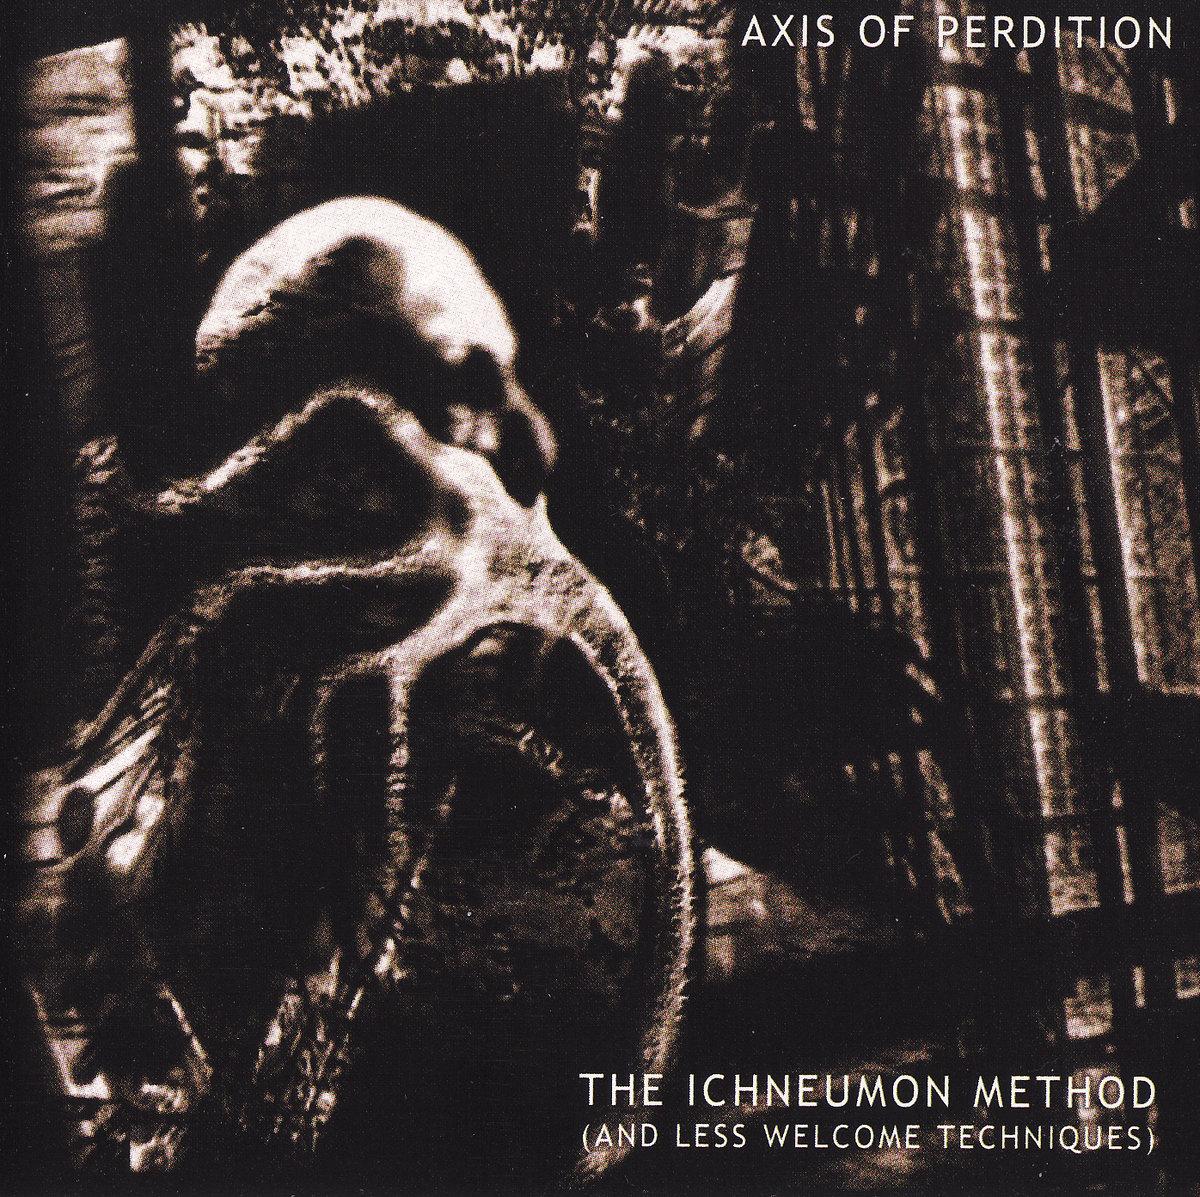 axis of perdition ichneumon